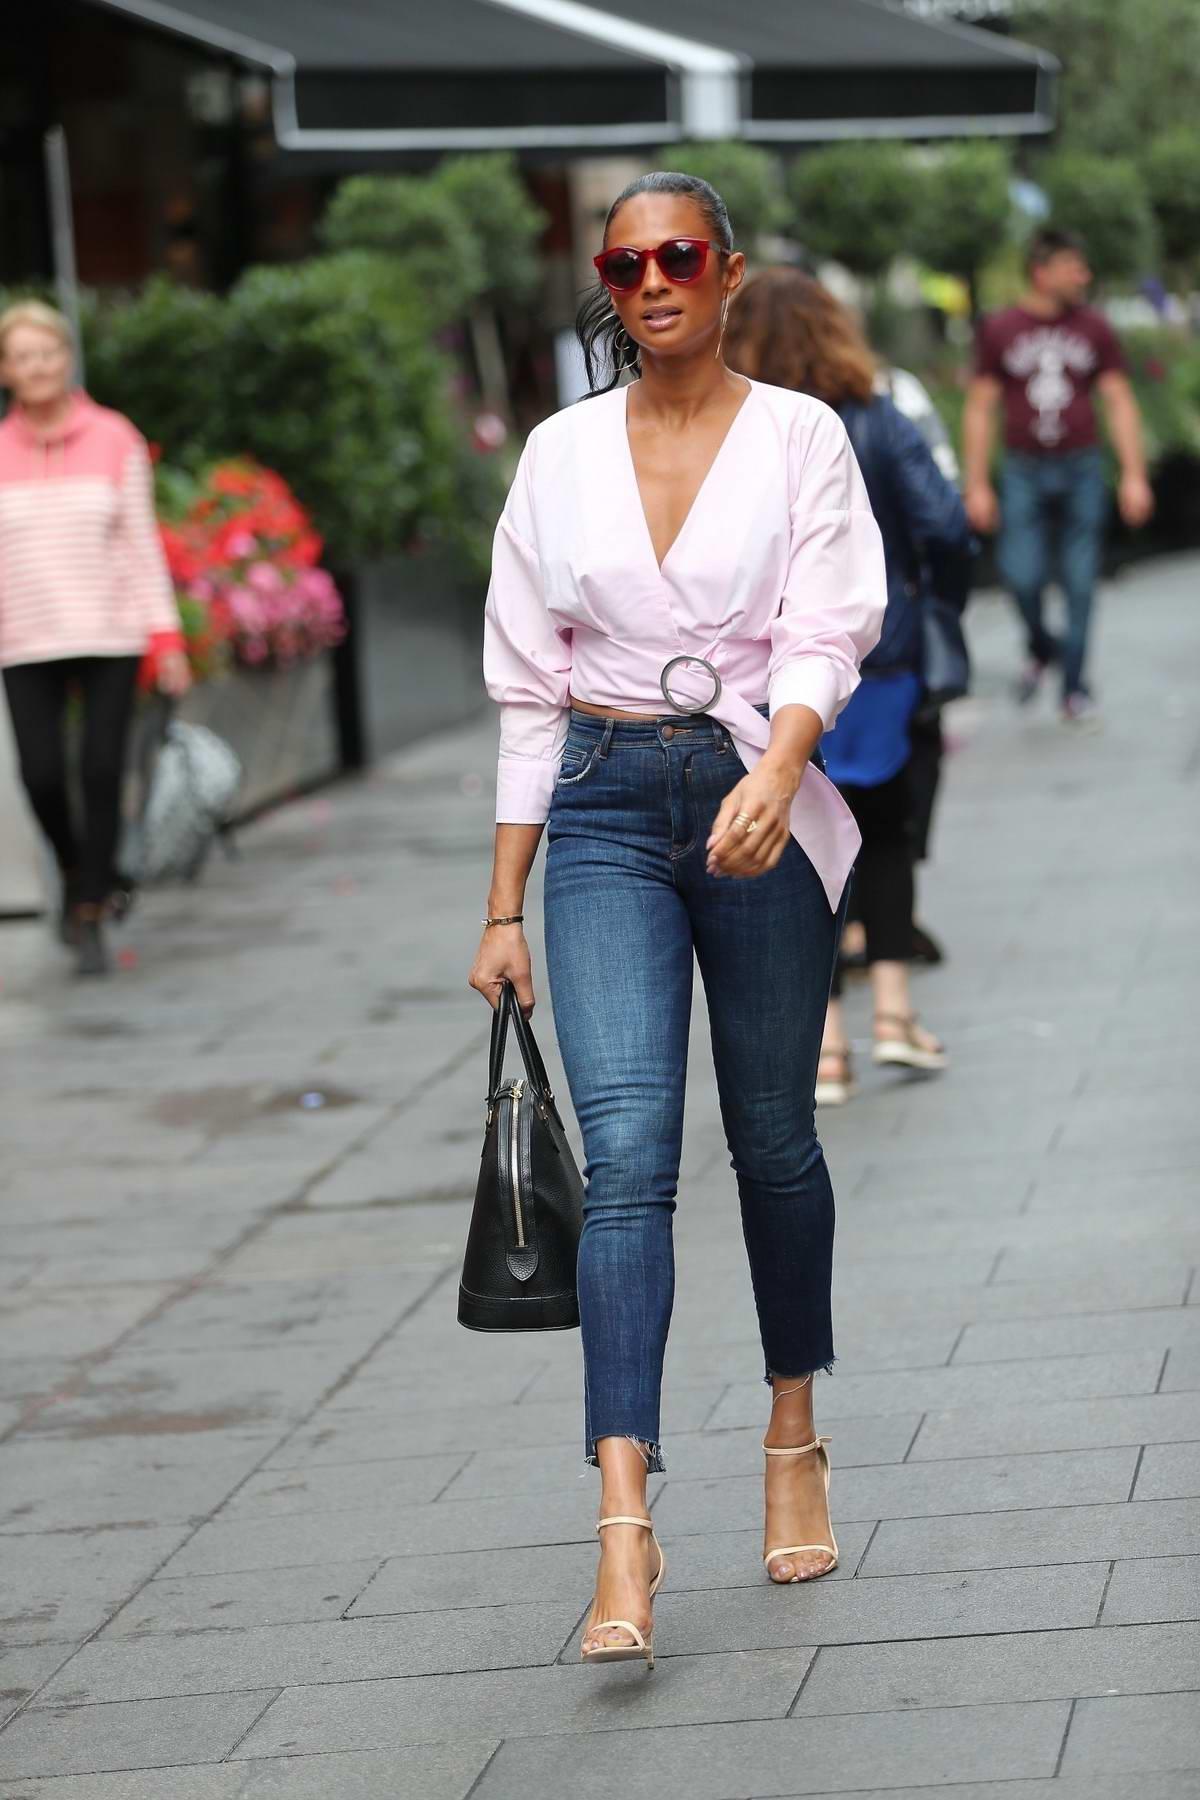 Alesha Dixon leaving the Global Radio in London